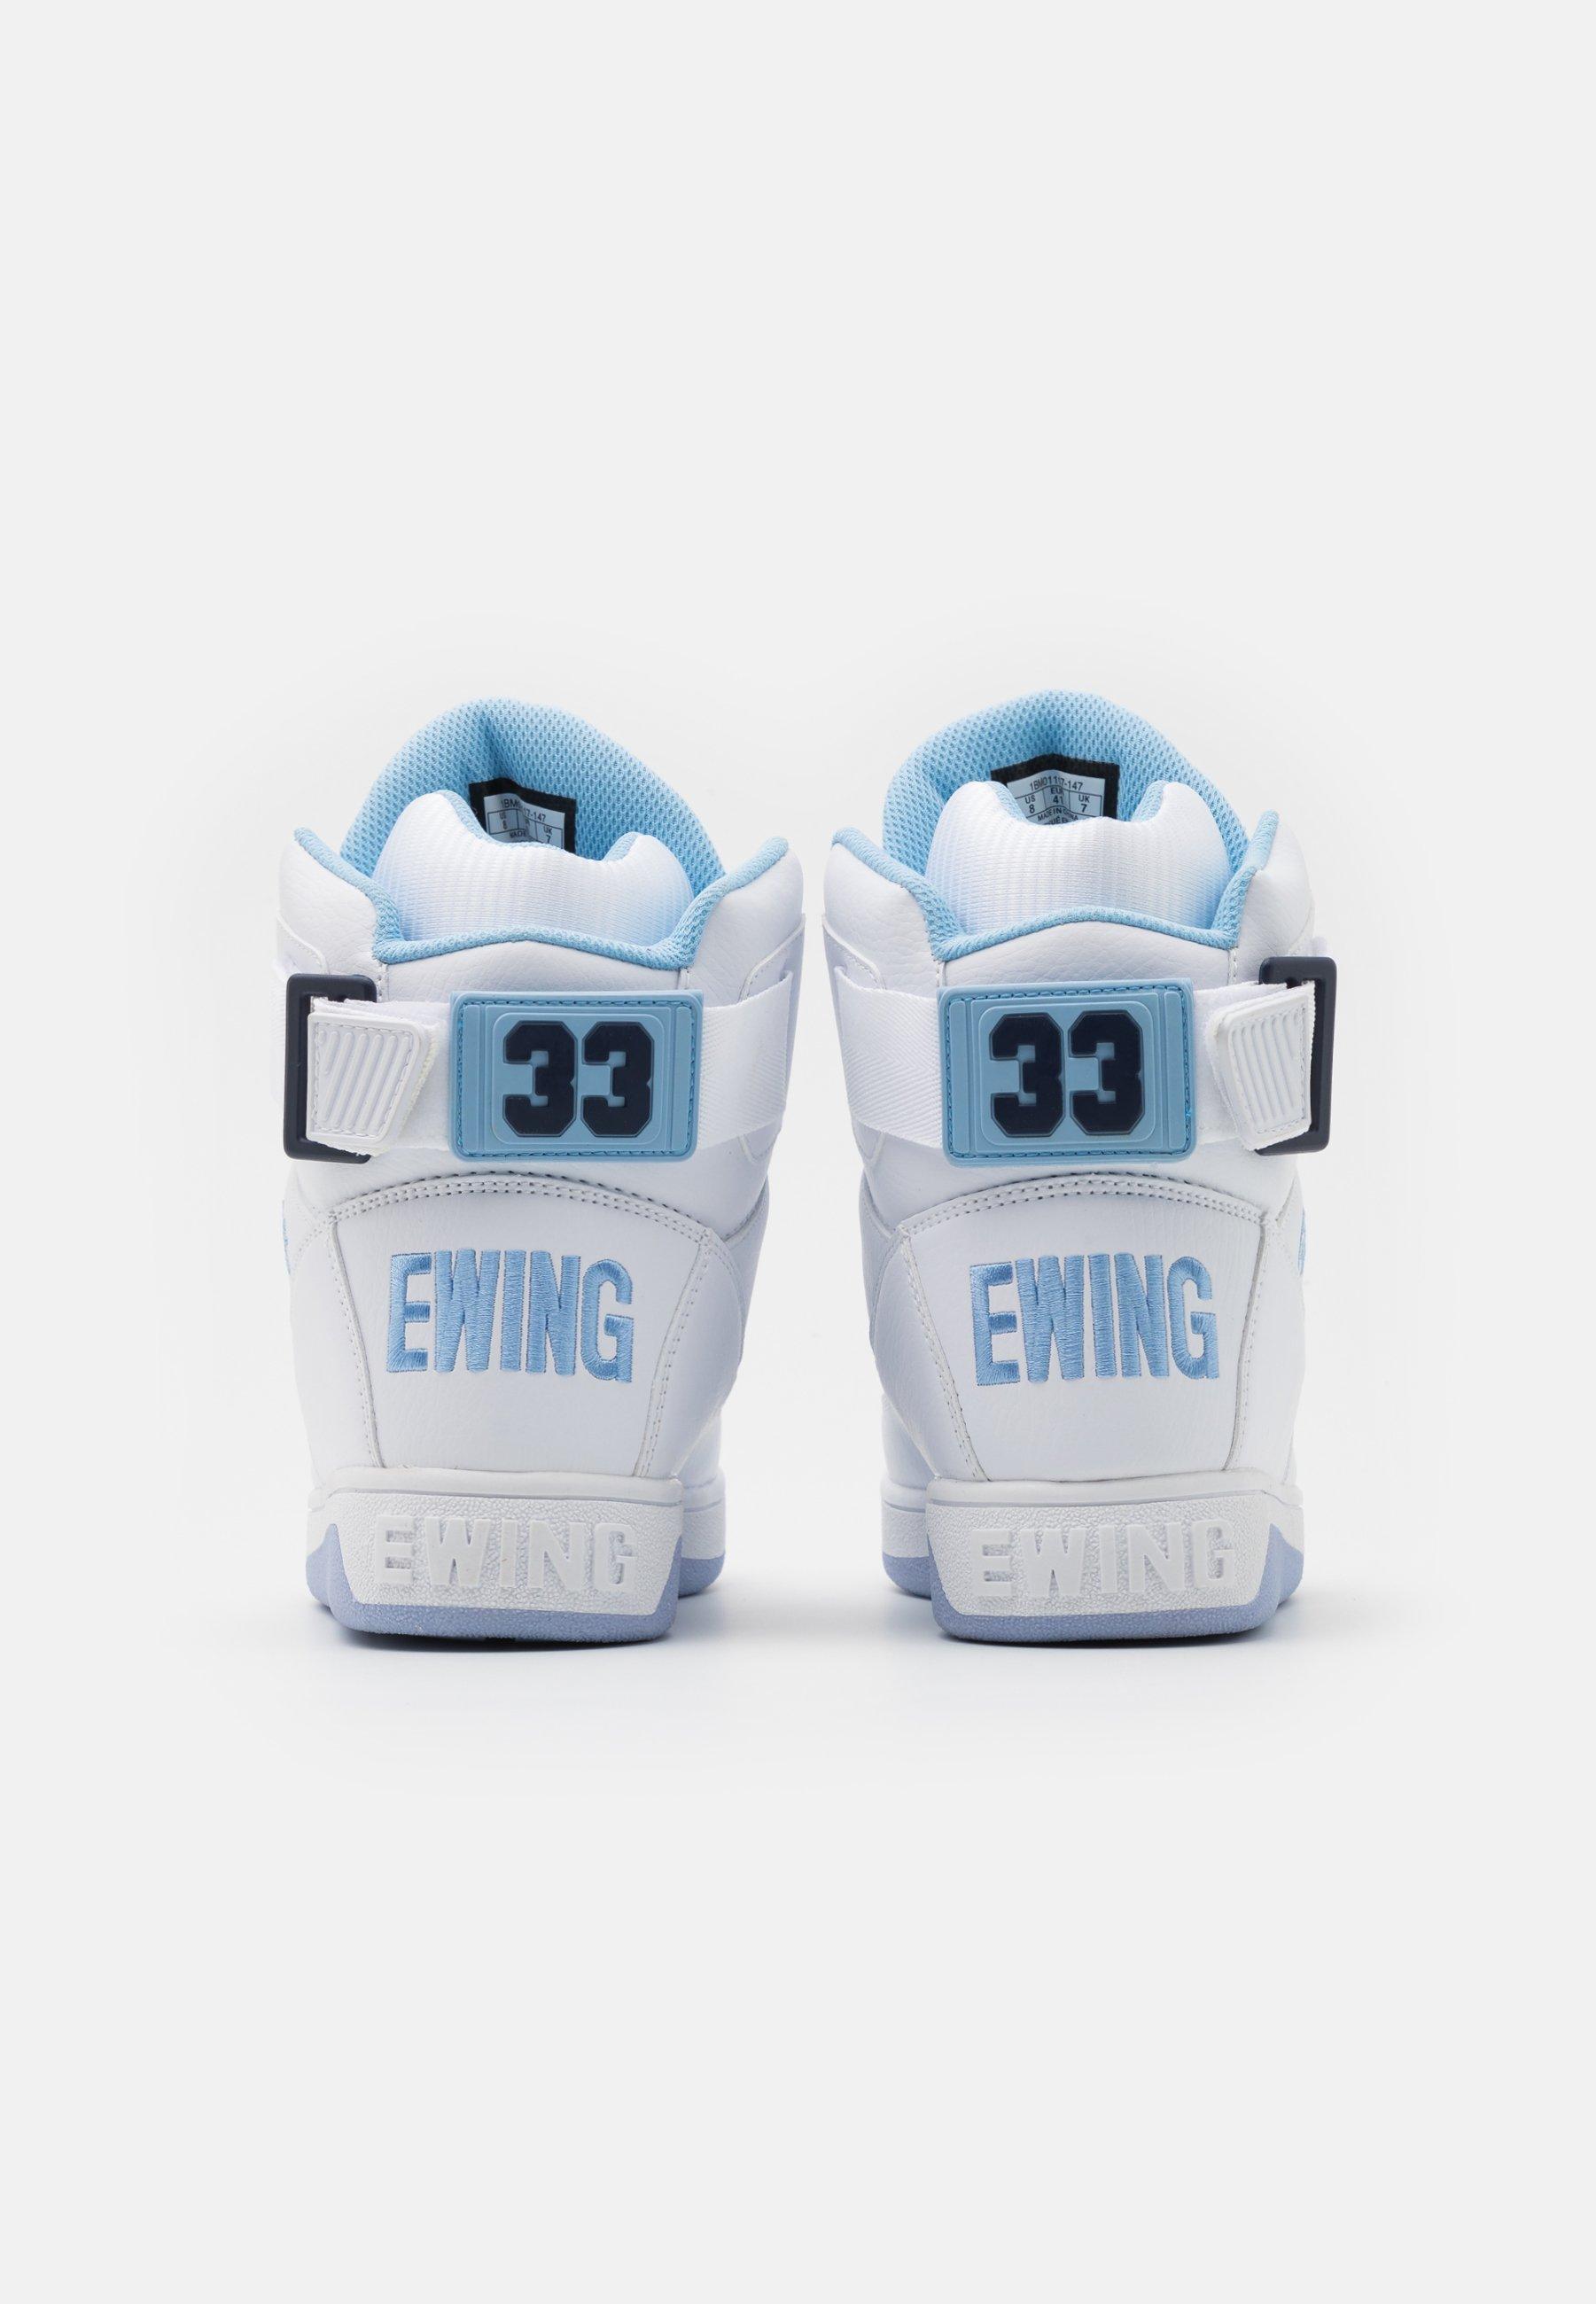 Uomo 33 - Sneakers alte